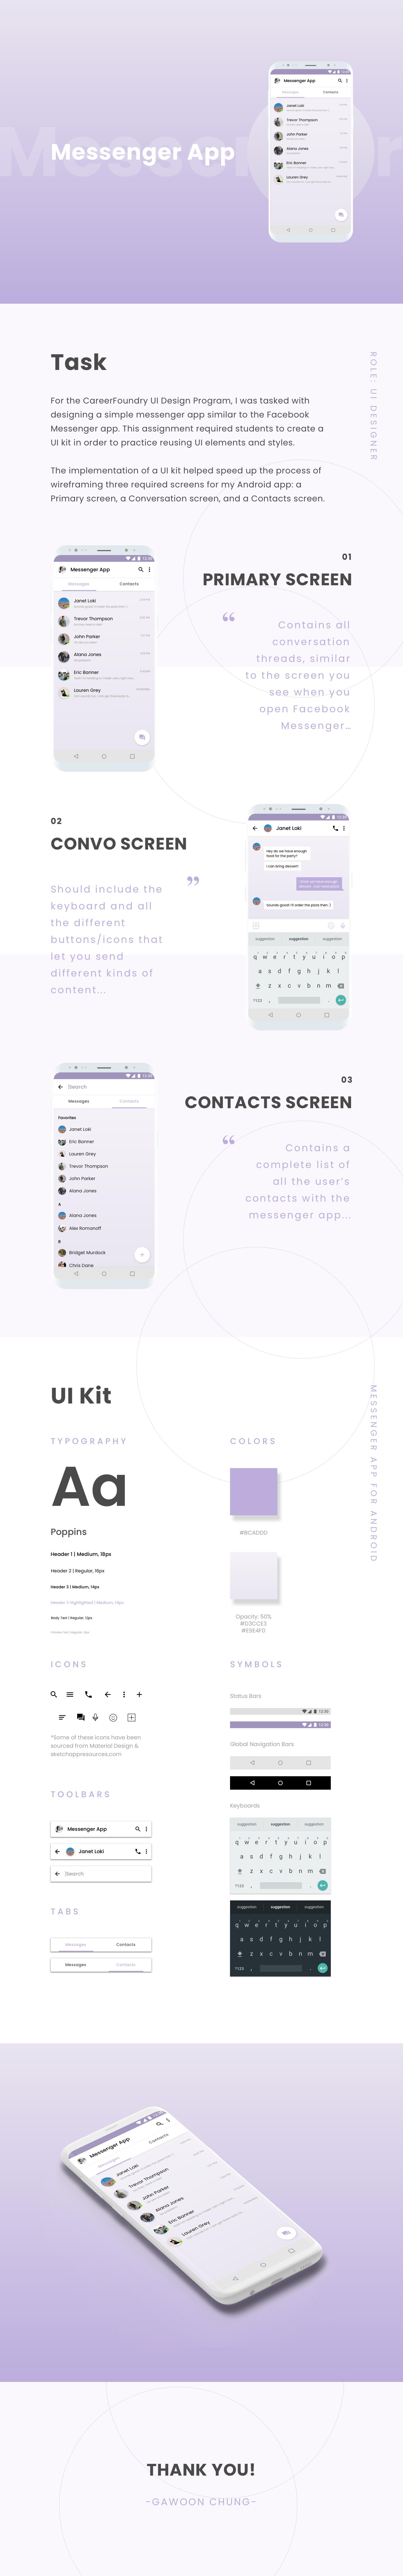 Case Study - Messenger App.png